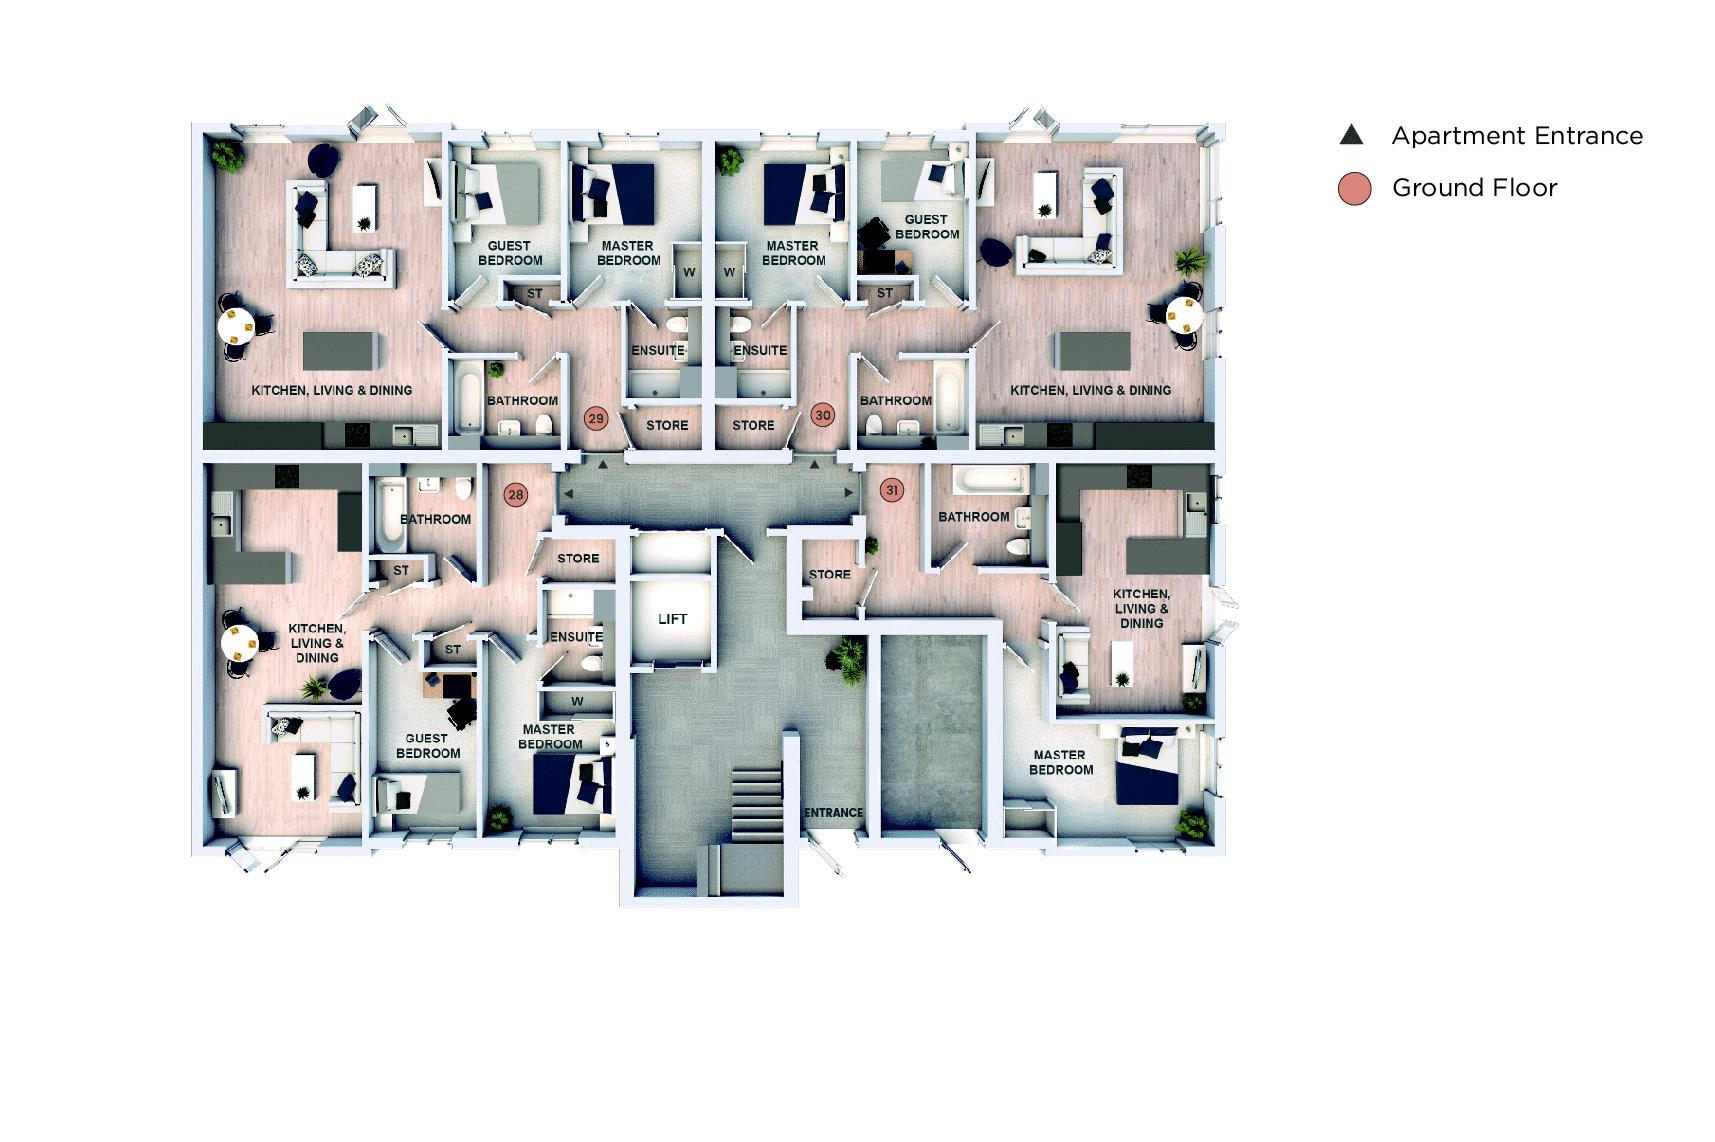 Ground Floor Apartments